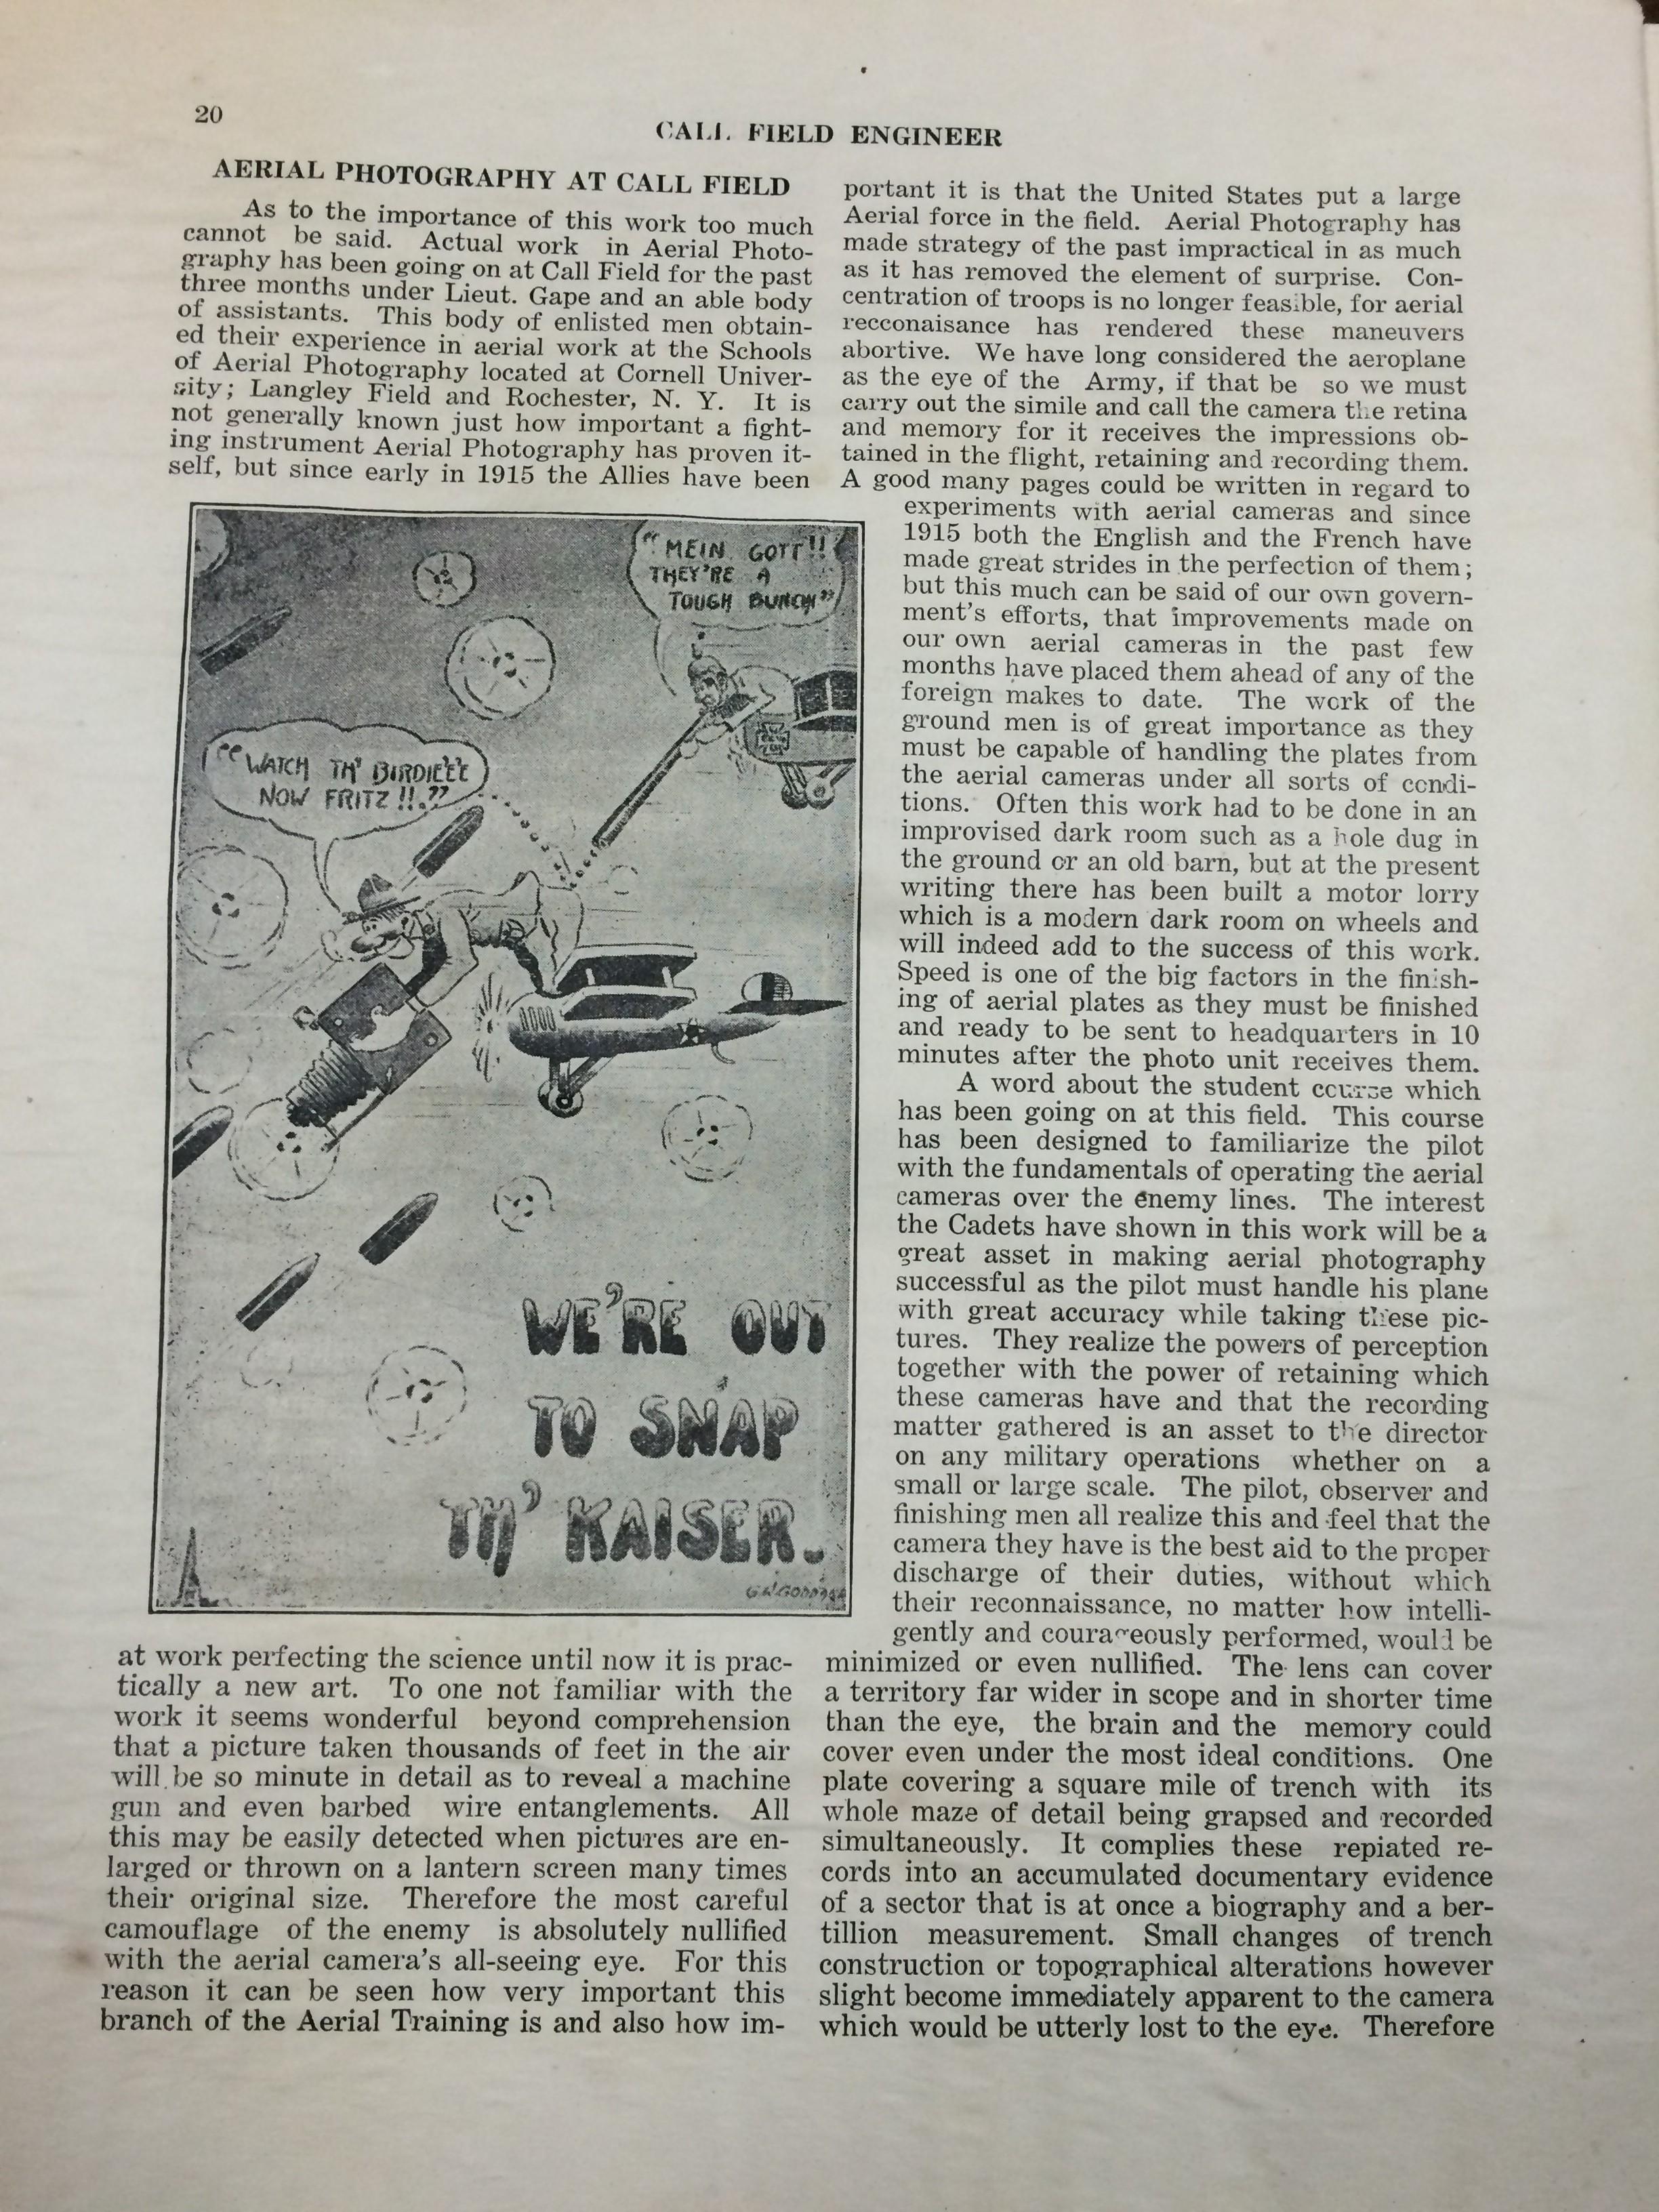 Image 22 July 1918 Call Field Engineer